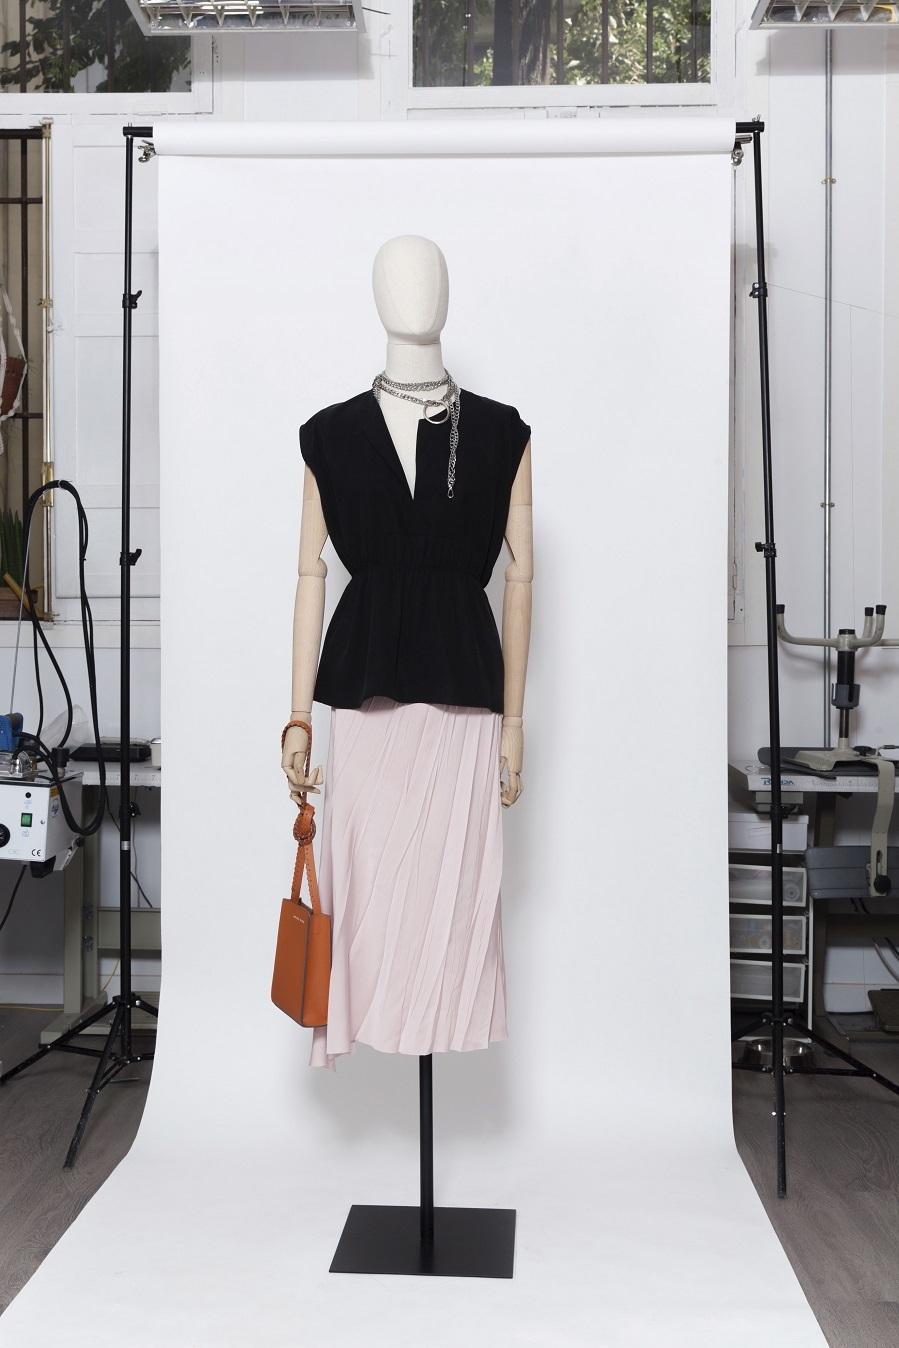 Presentación de Moisés Nieto - Colección primavera-verano 2021 - 72 edición Mercedes-Benz Madrid Fashion Week